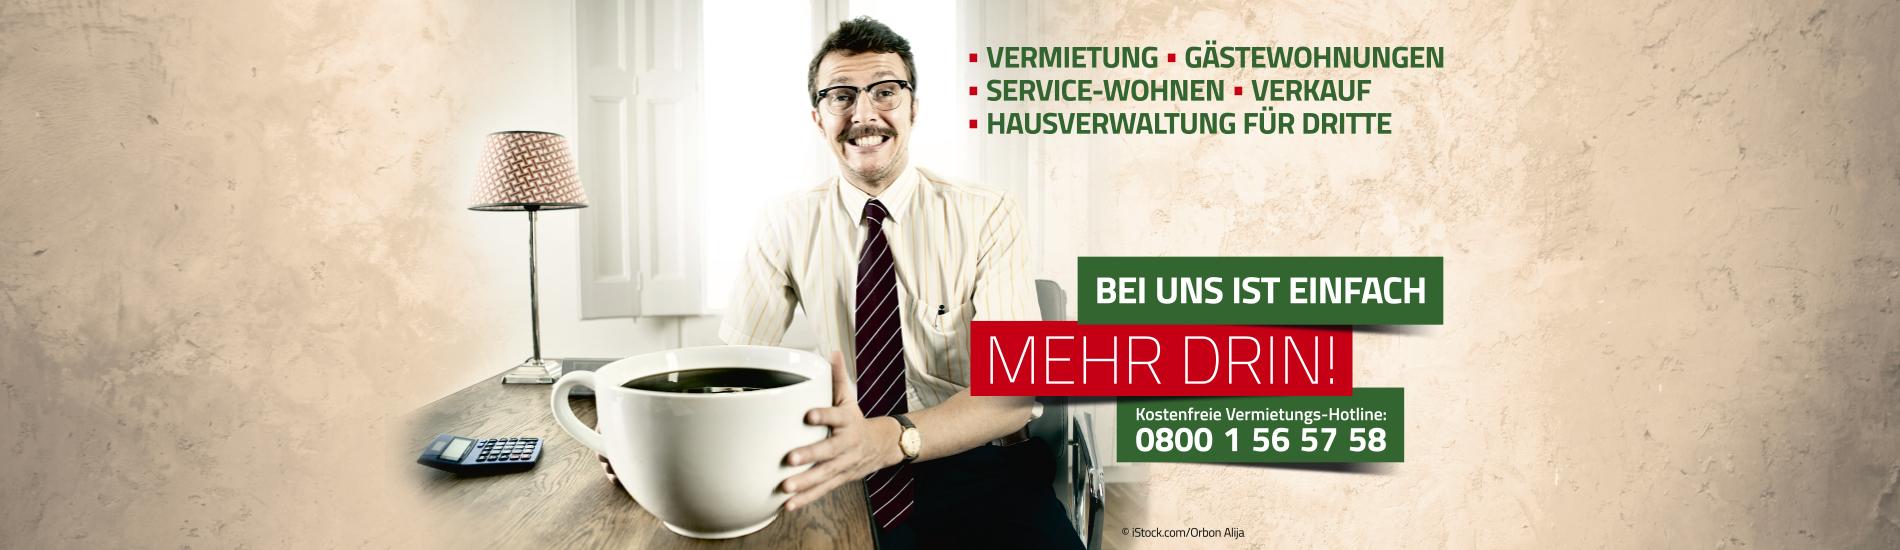 Slider_Kaffeetasse_1900x550px